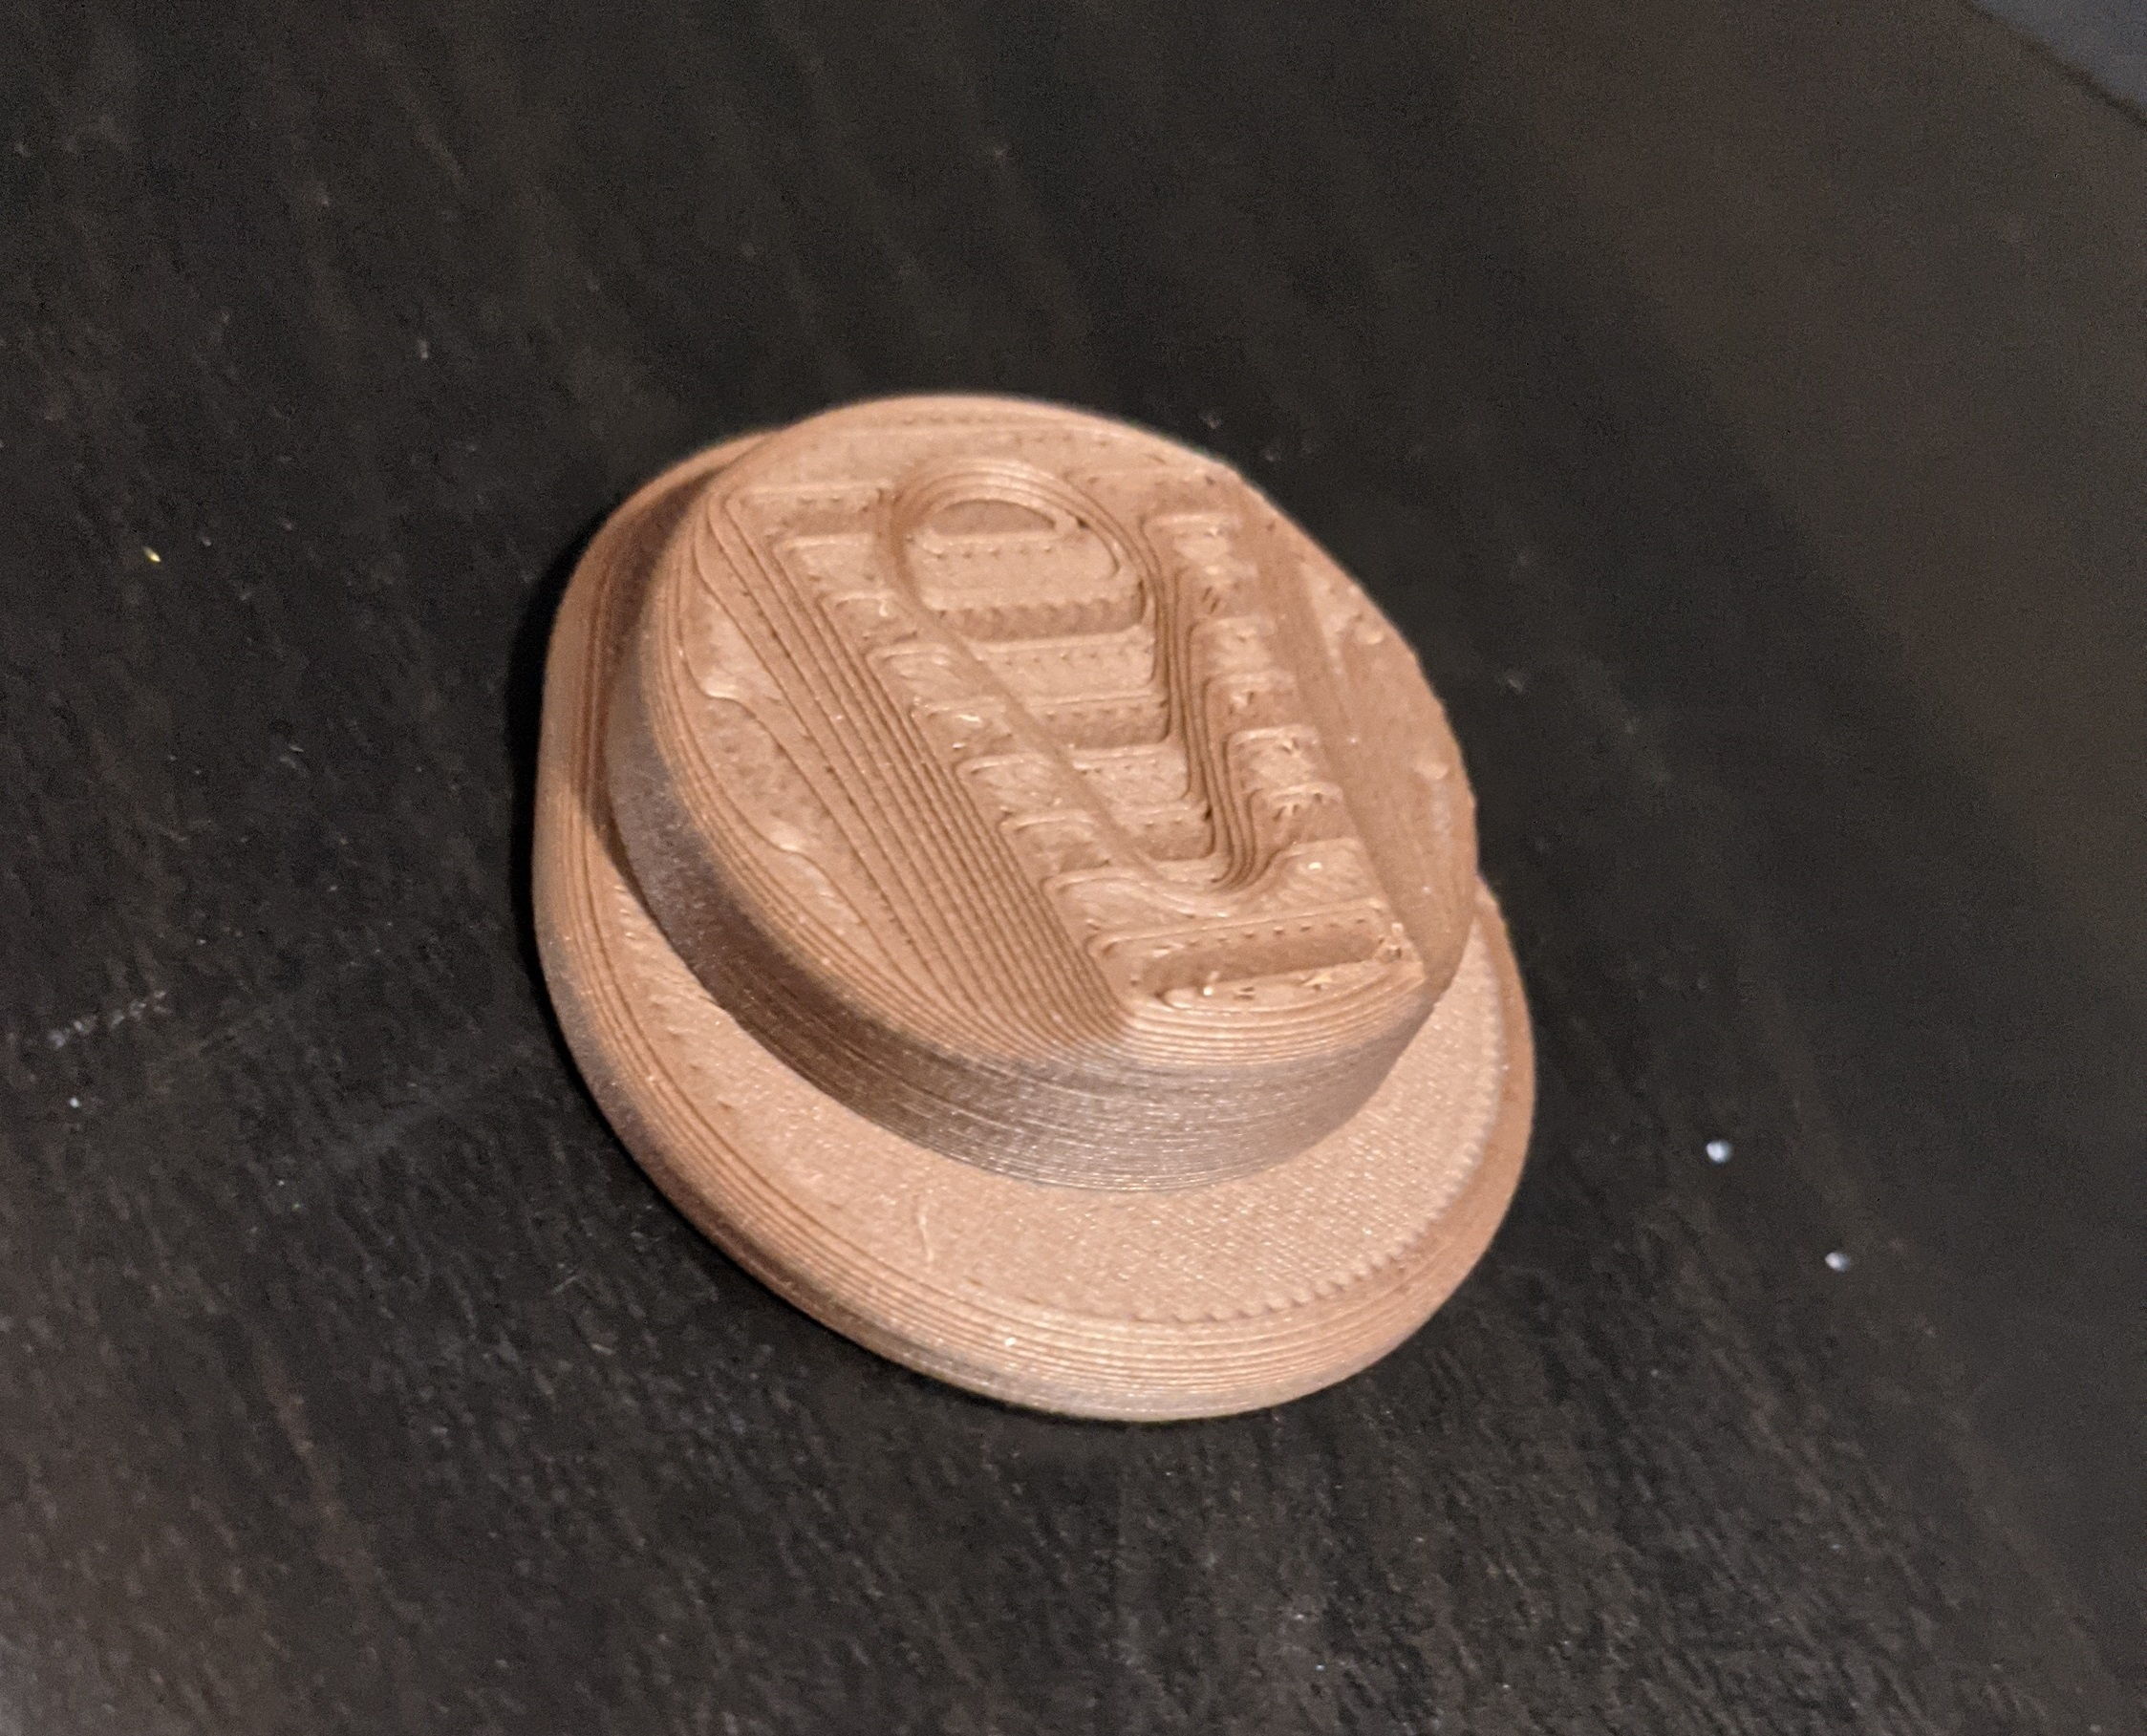 PXL_20201224_172422399.jpg Download free STL file Roblox accesories  • 3D printer template, 3DPrintersaur